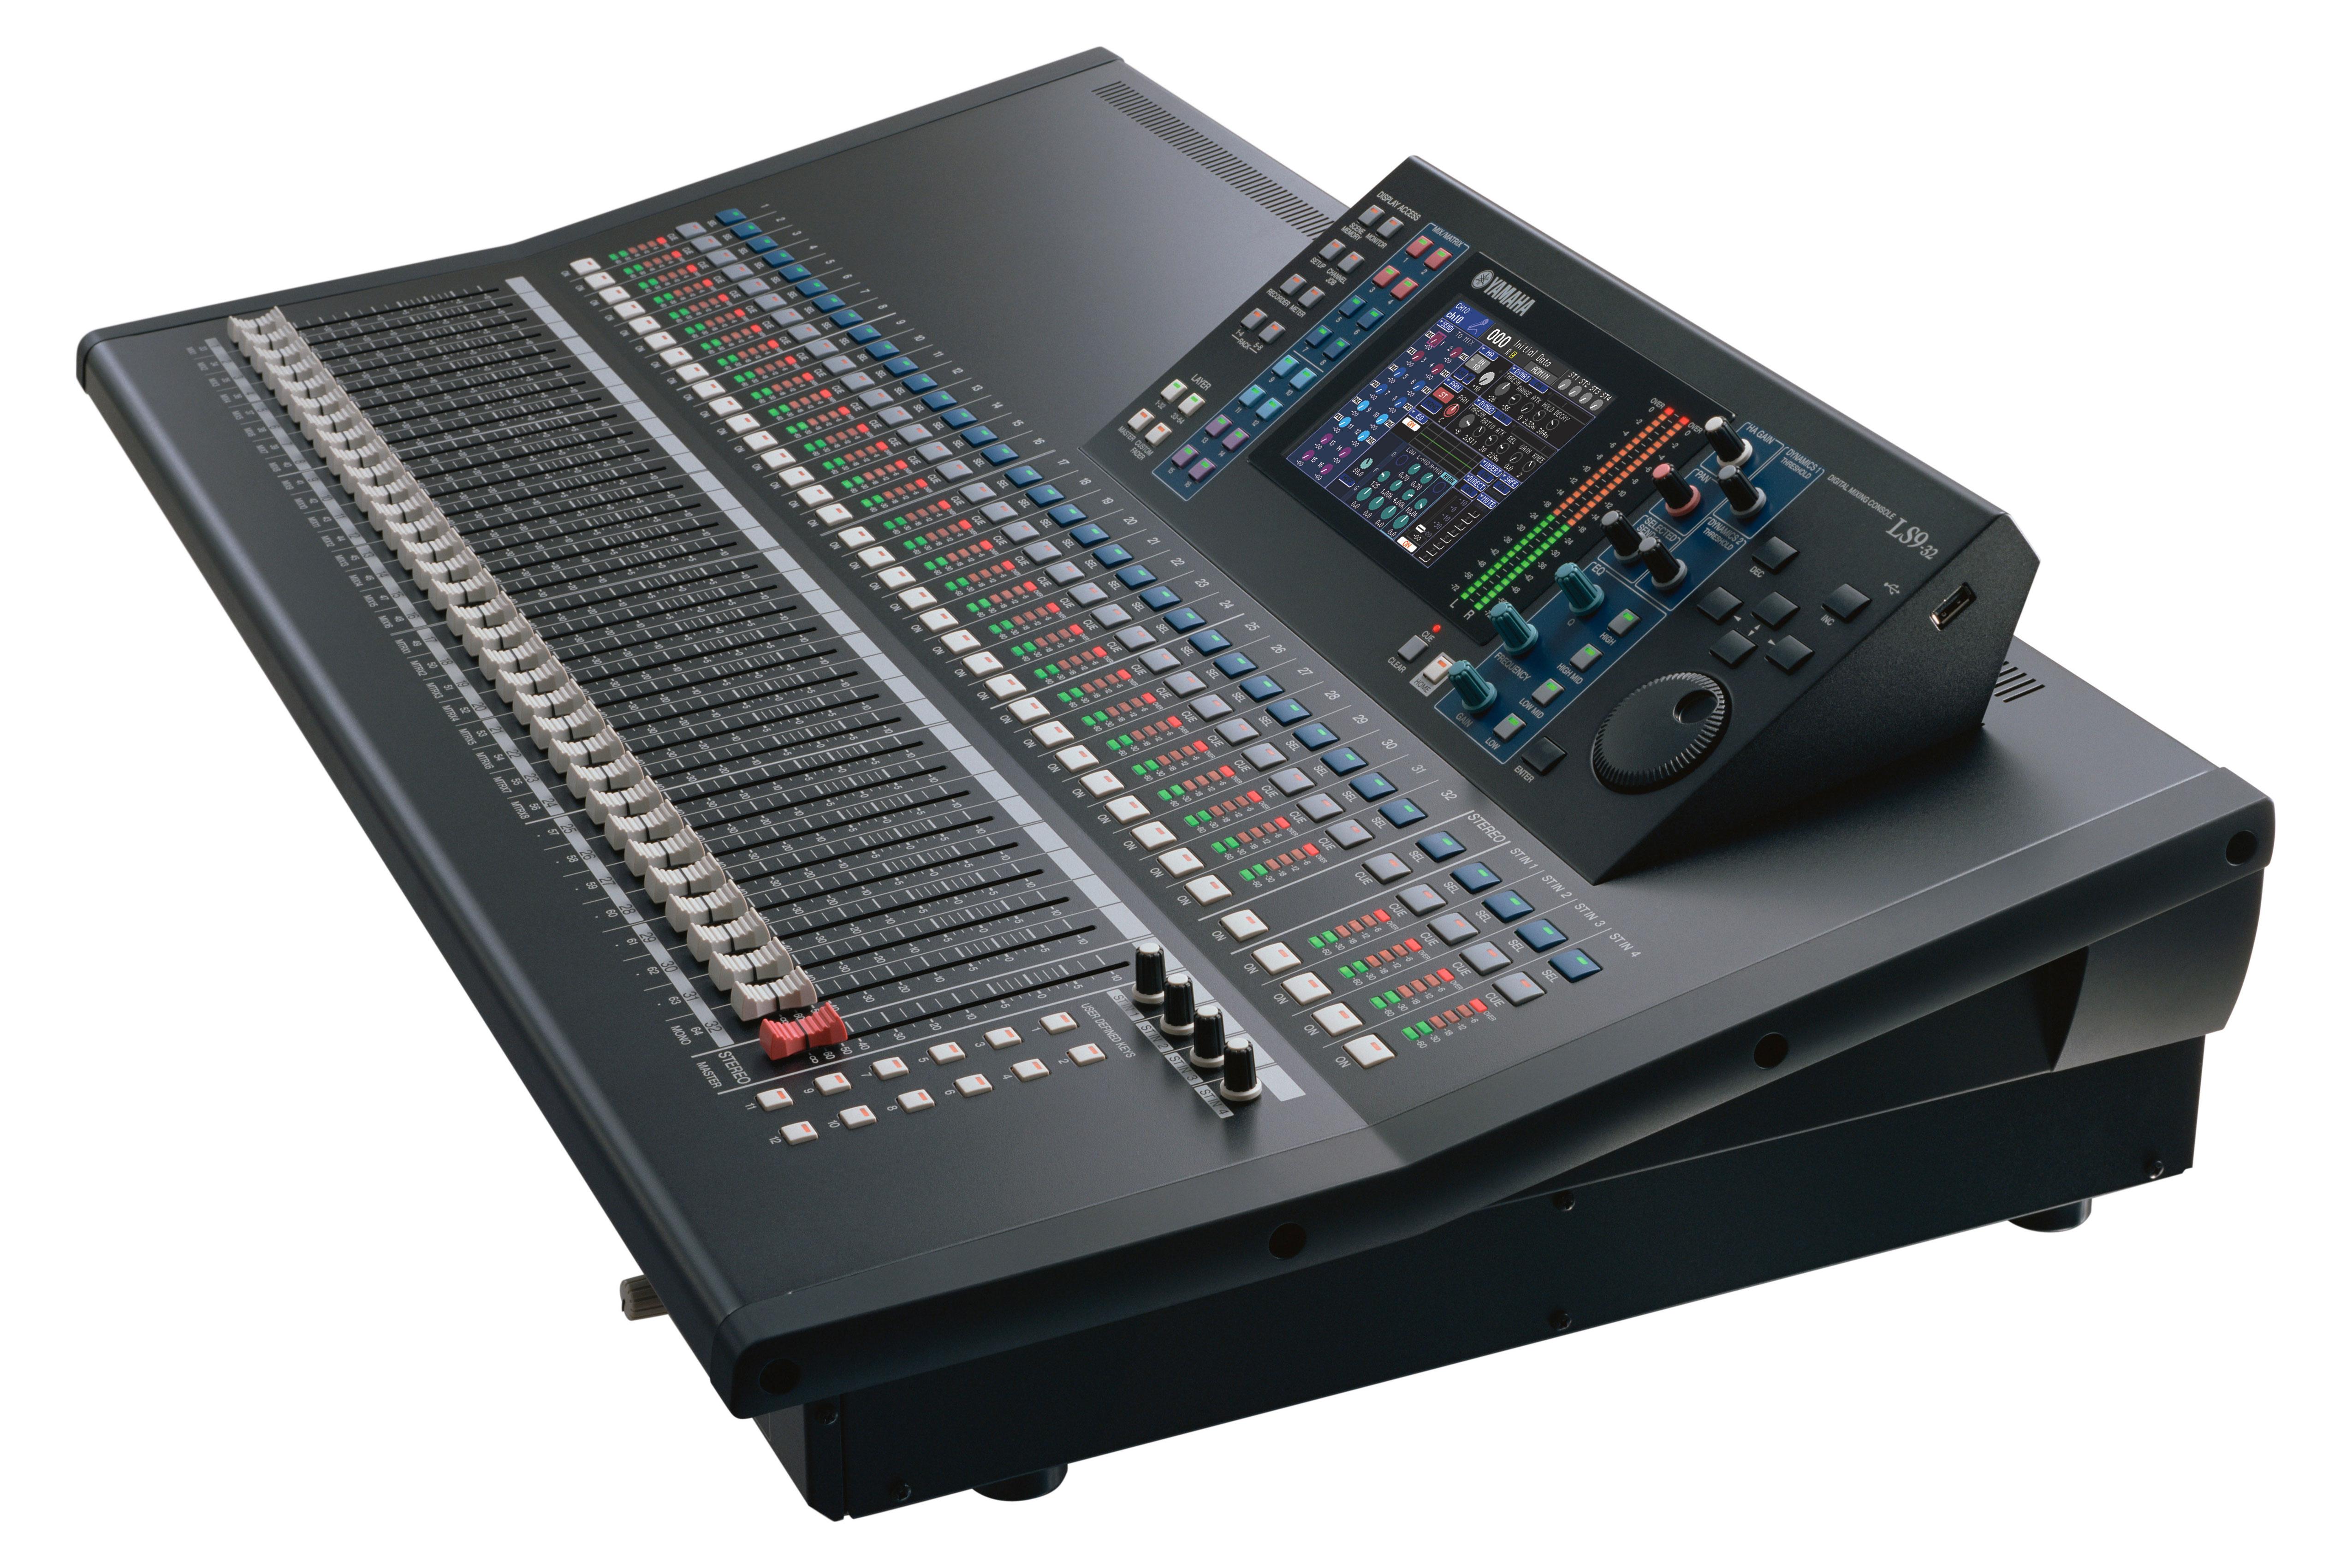 yamaha ls9 32 digital mixing desk innovation productions. Black Bedroom Furniture Sets. Home Design Ideas